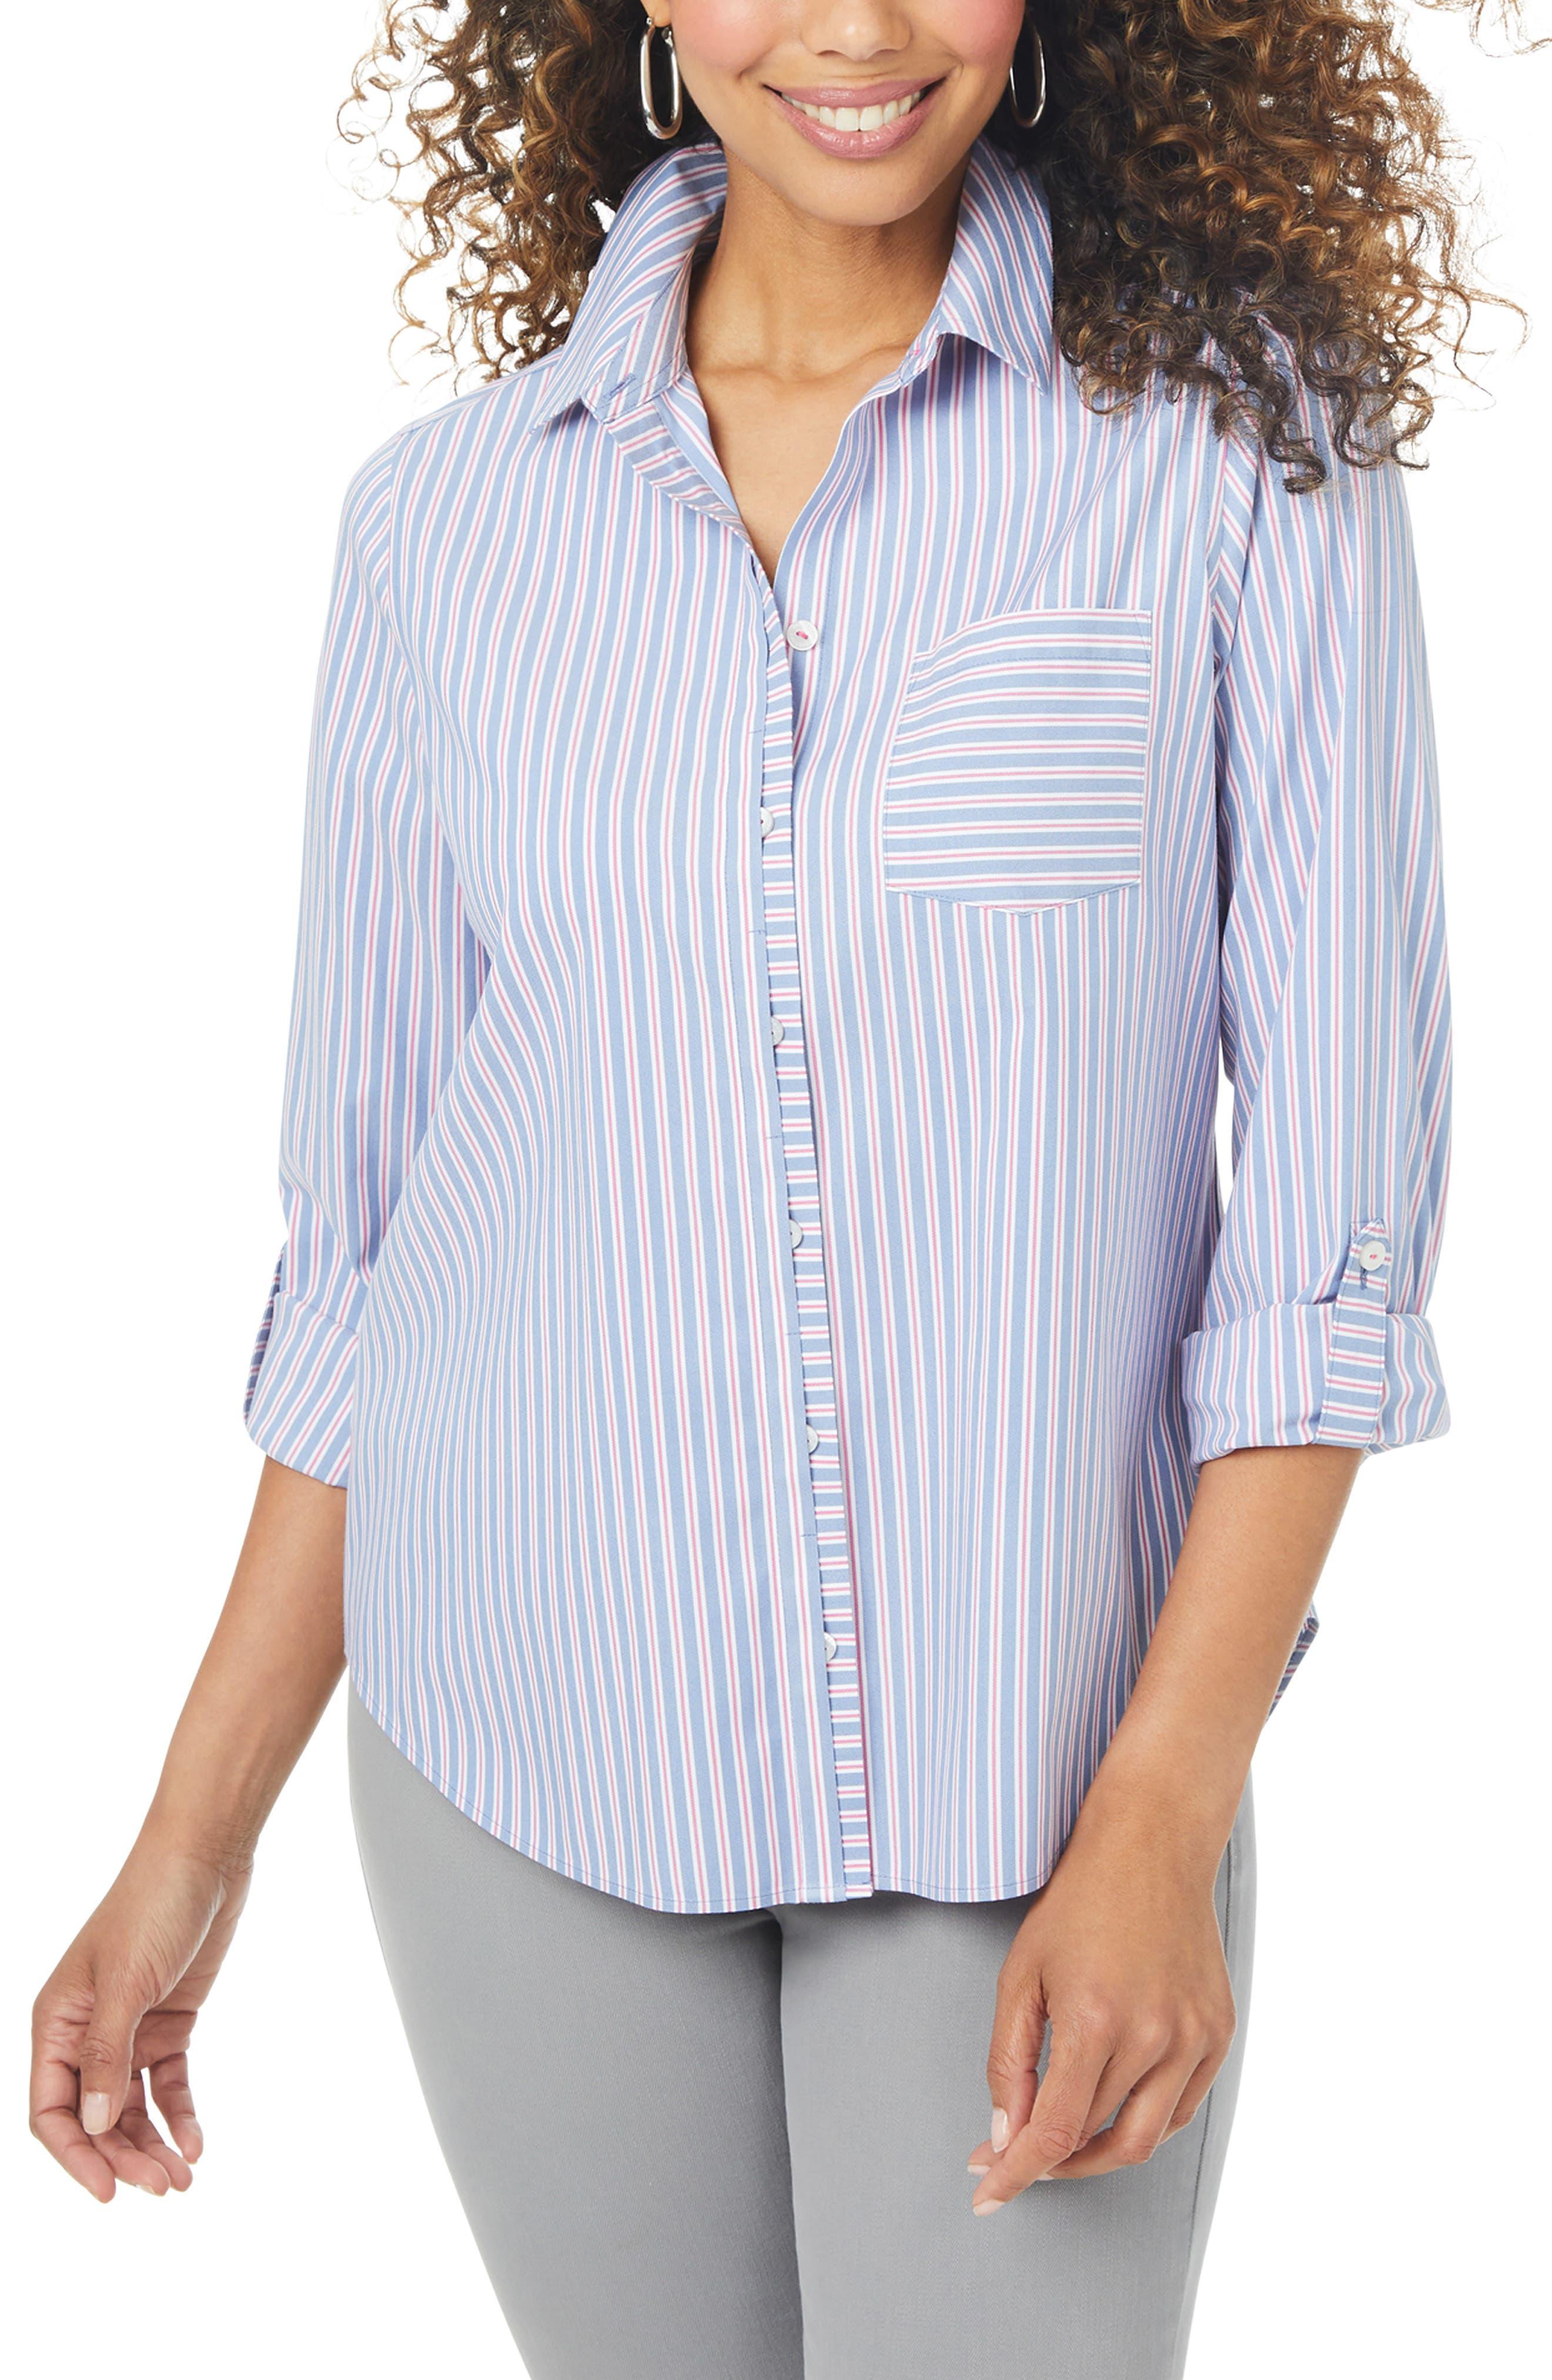 Charlie Weekend Stripe Non-Iron Stretch Button-Up Shirt